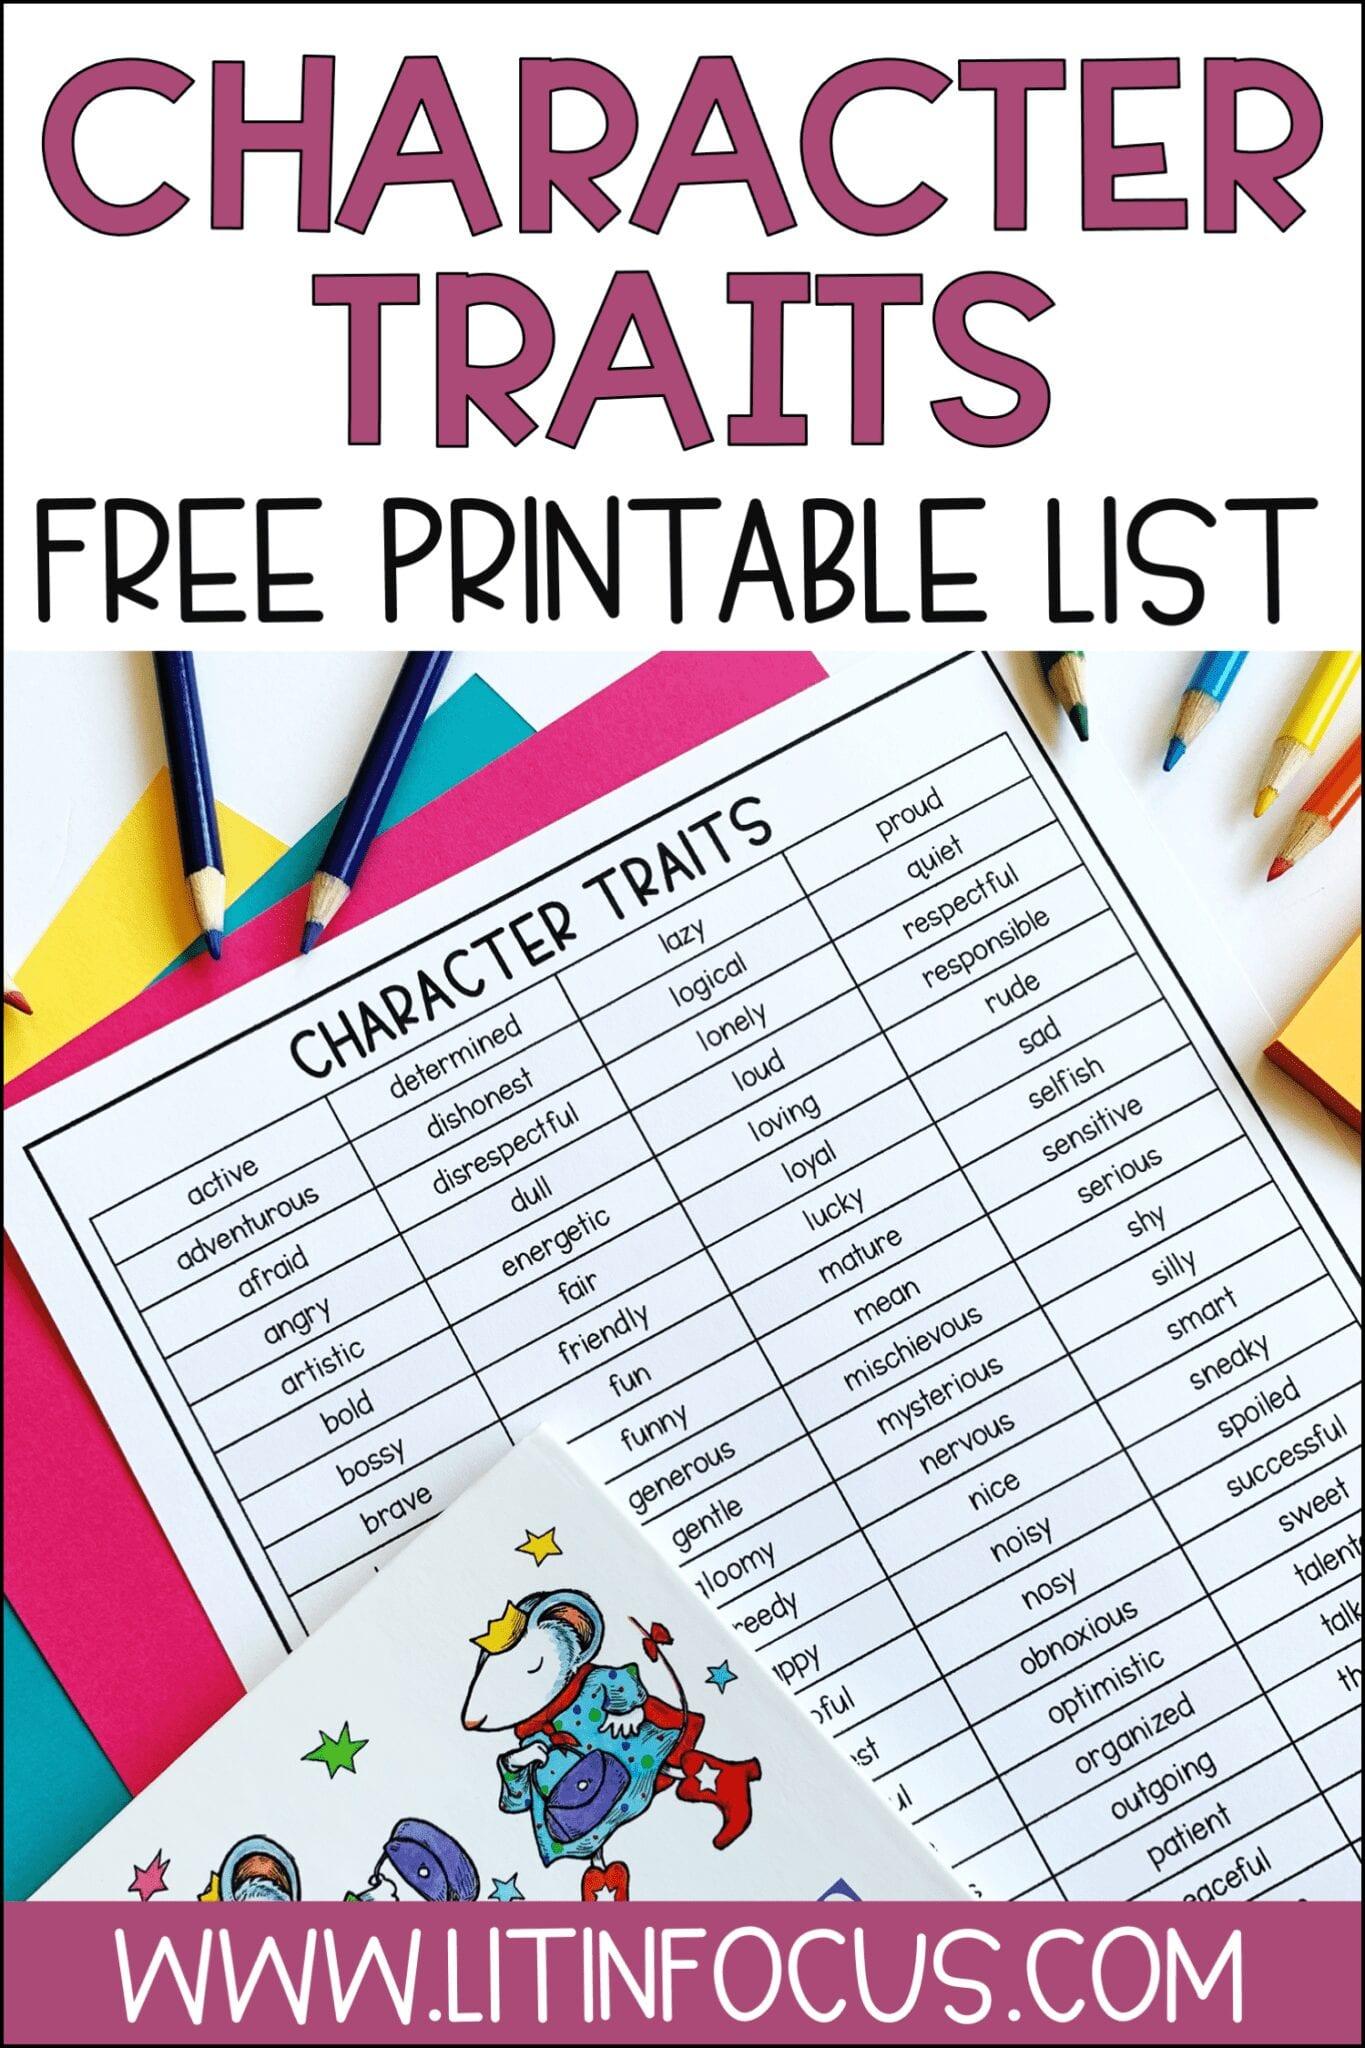 Character Traits Free Printable List